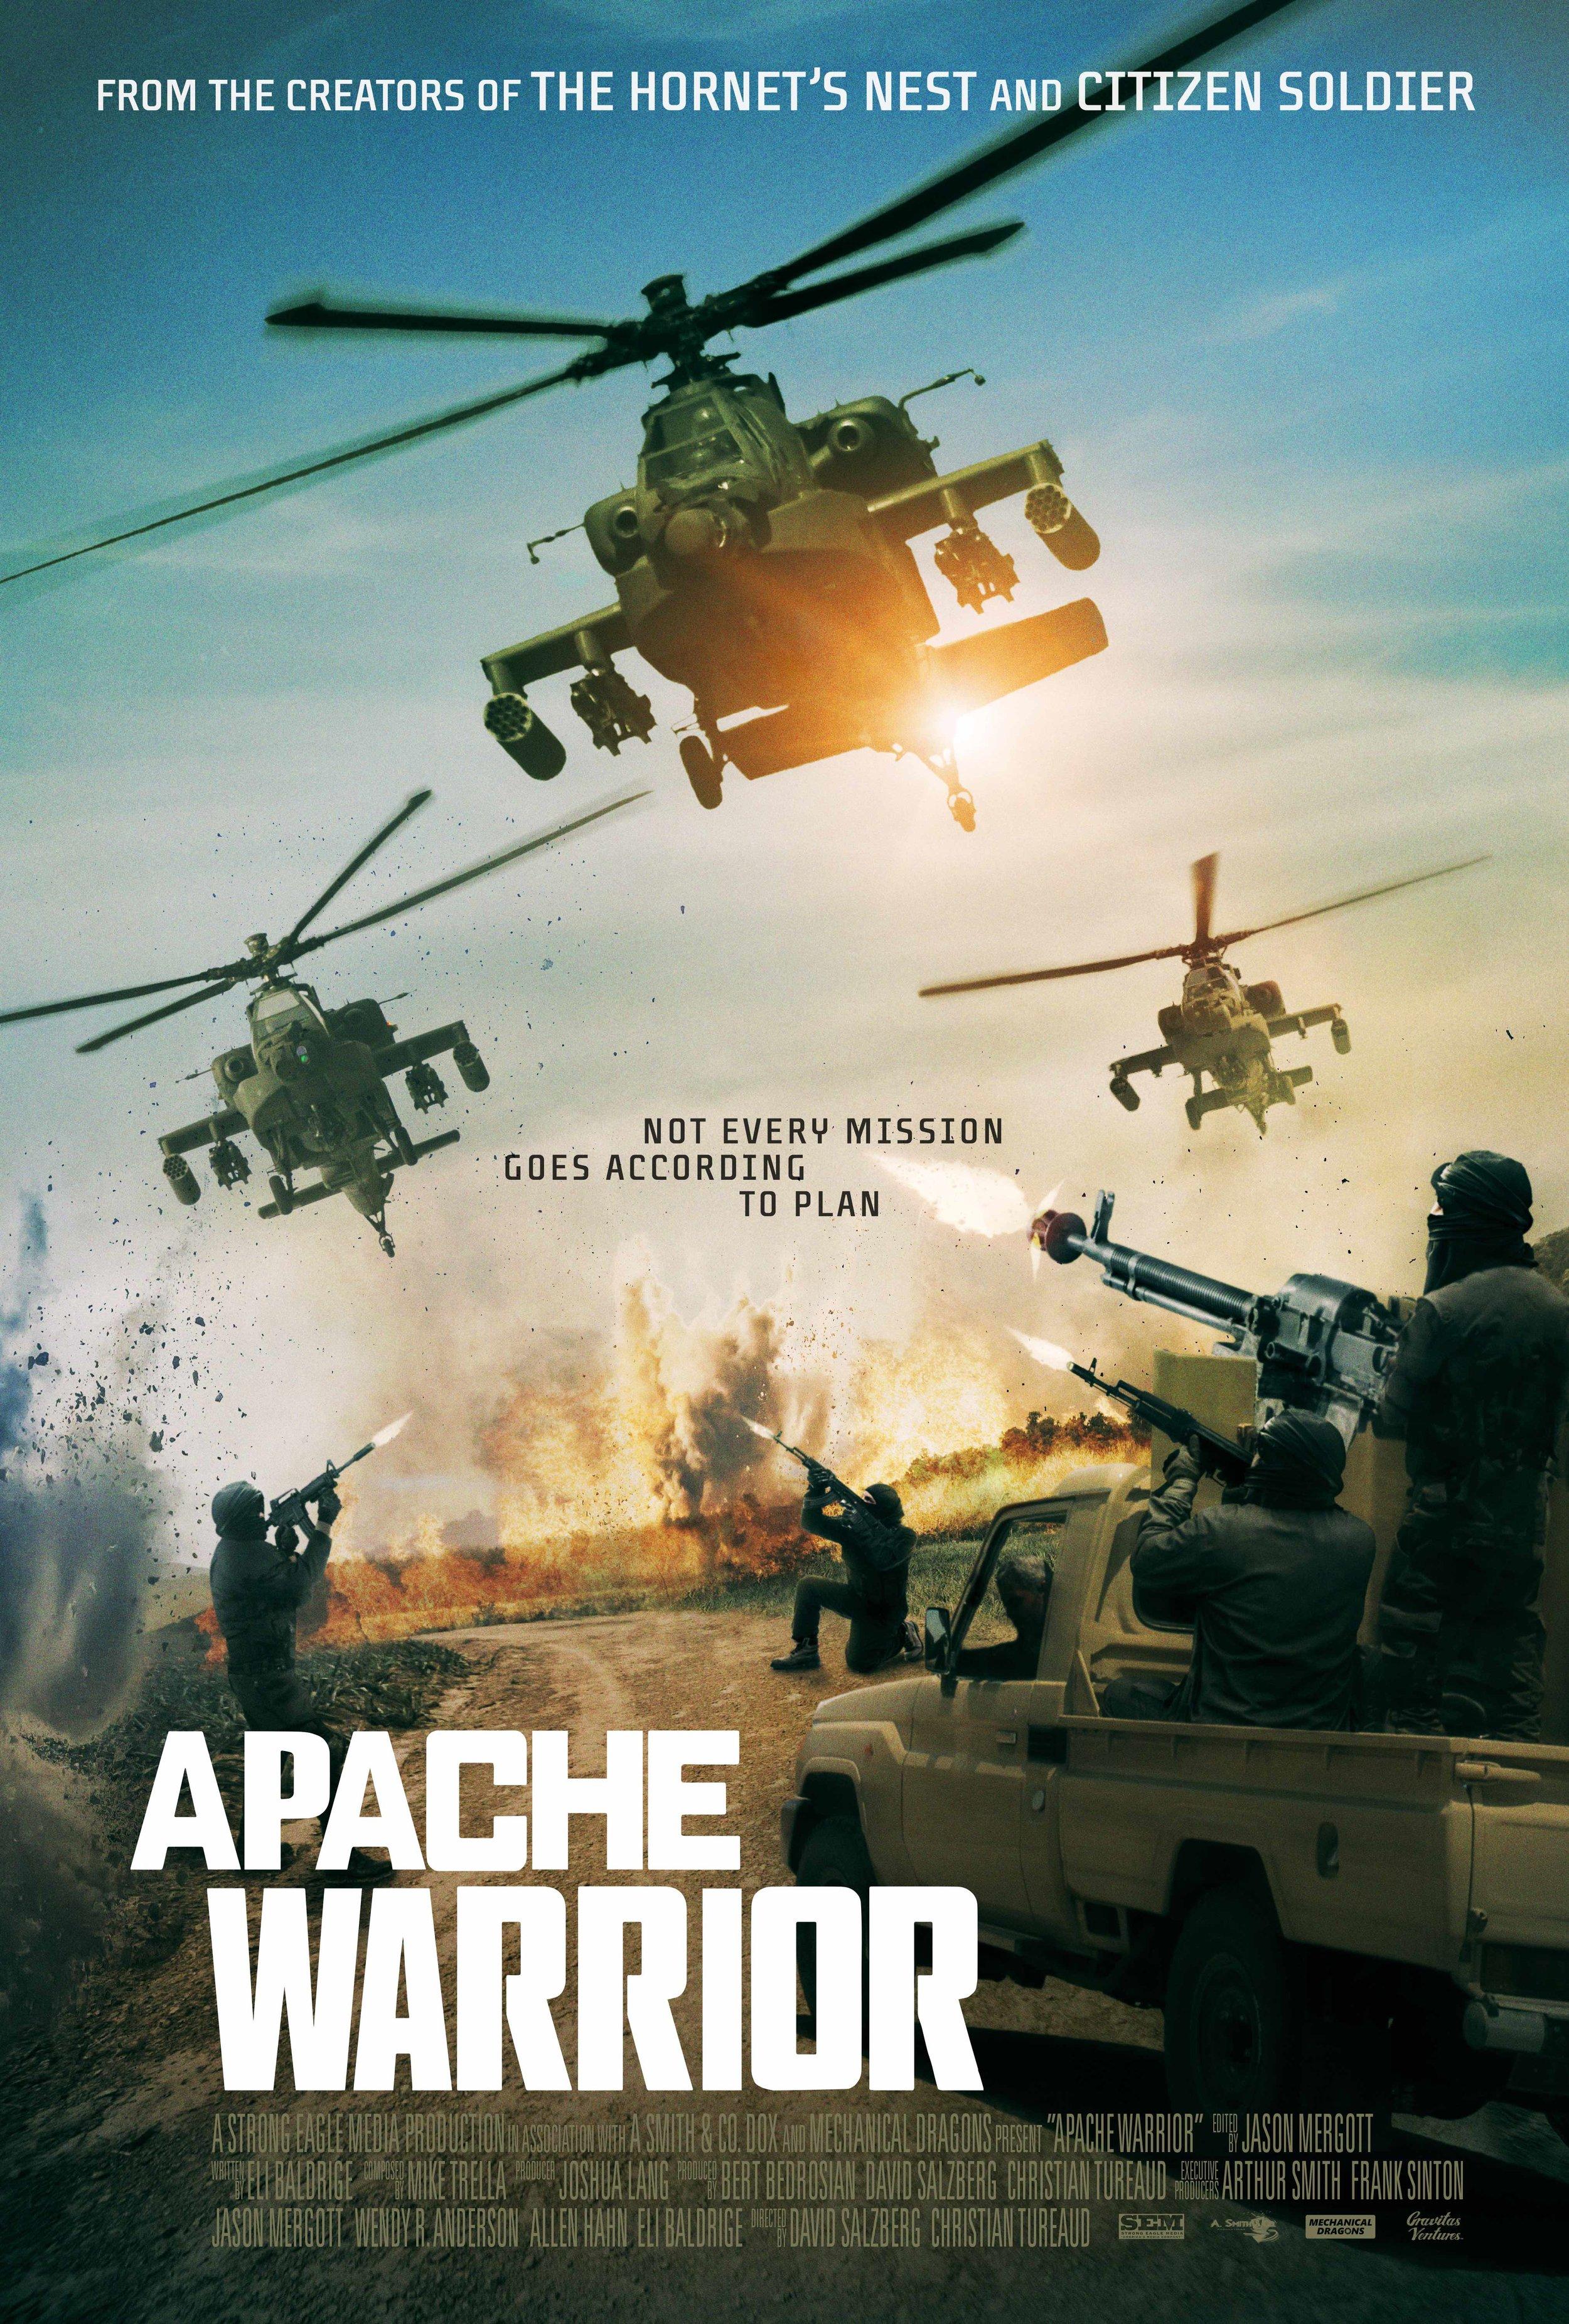 Apache_Warrior_27x40_KeyArt_V1_small.jpg